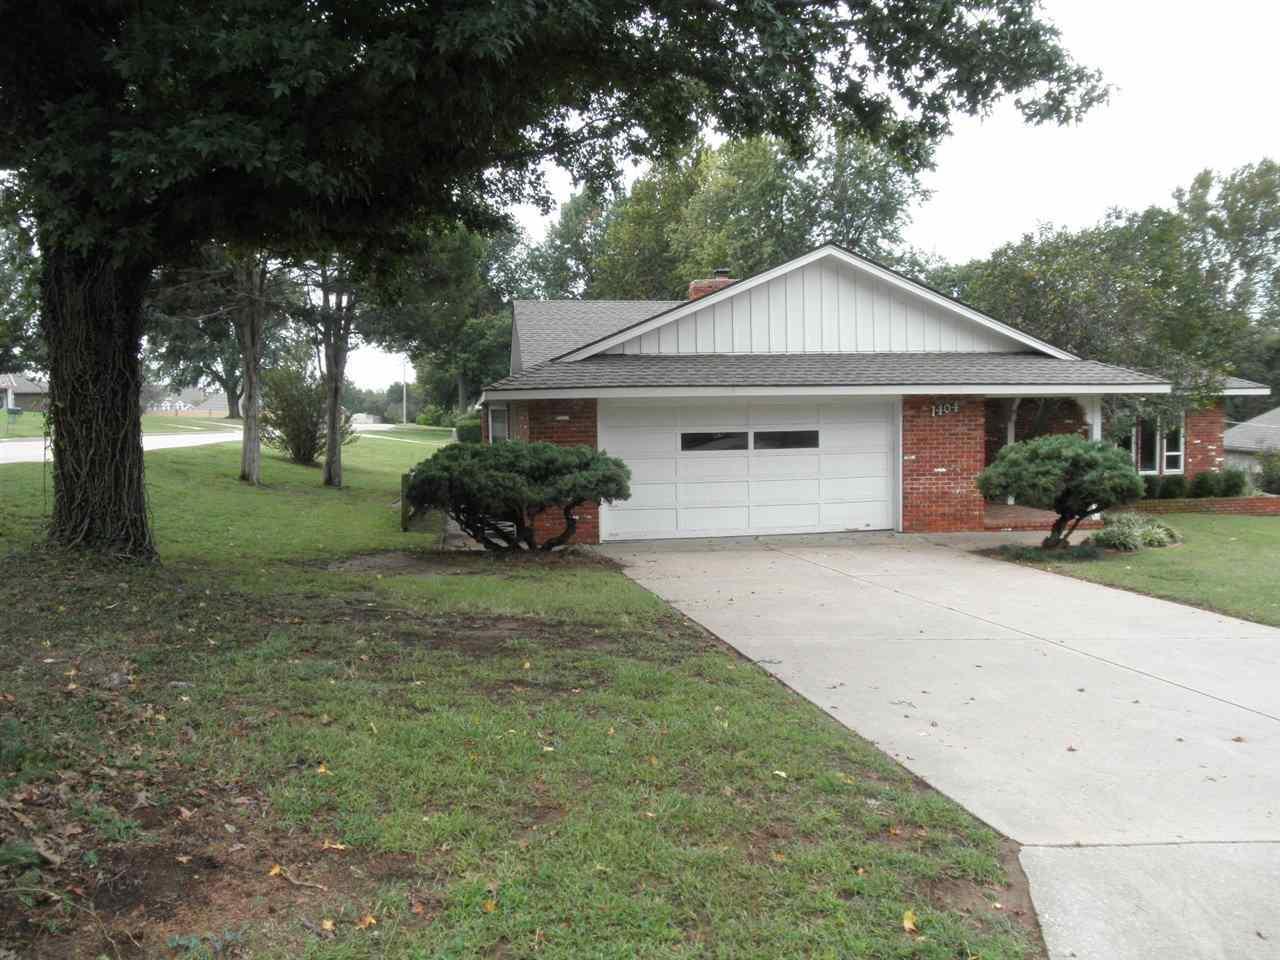 Sold Intraoffice W/MLS | 1404 Meadowbrook Ponca City, OK 74604 24